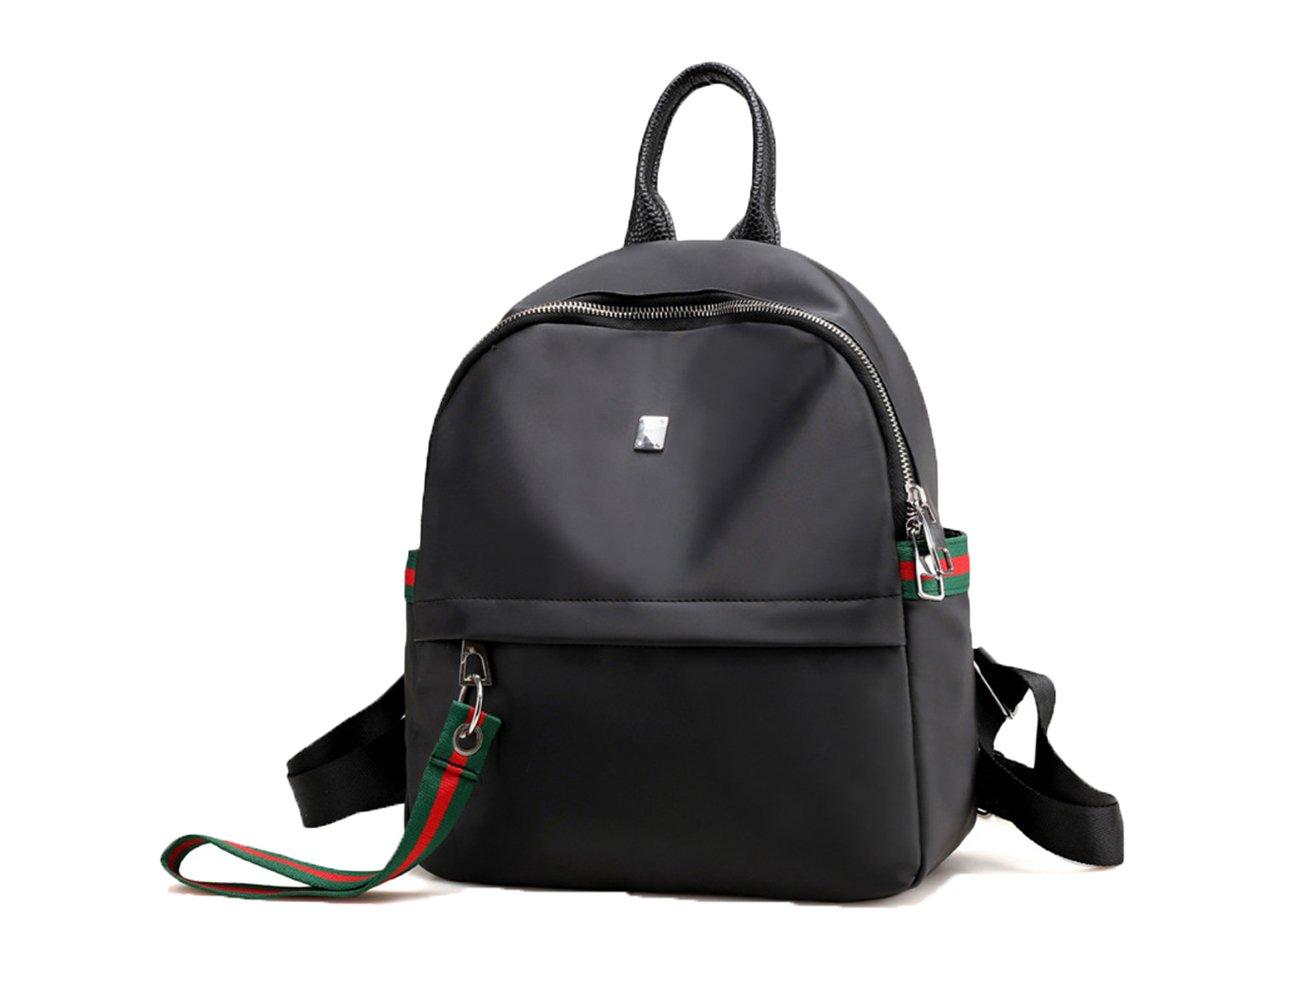 Seruno Oxford Backpack Purse Fashion Waterproof Backpacks Casual Shoulder Bags For Women Ribbon